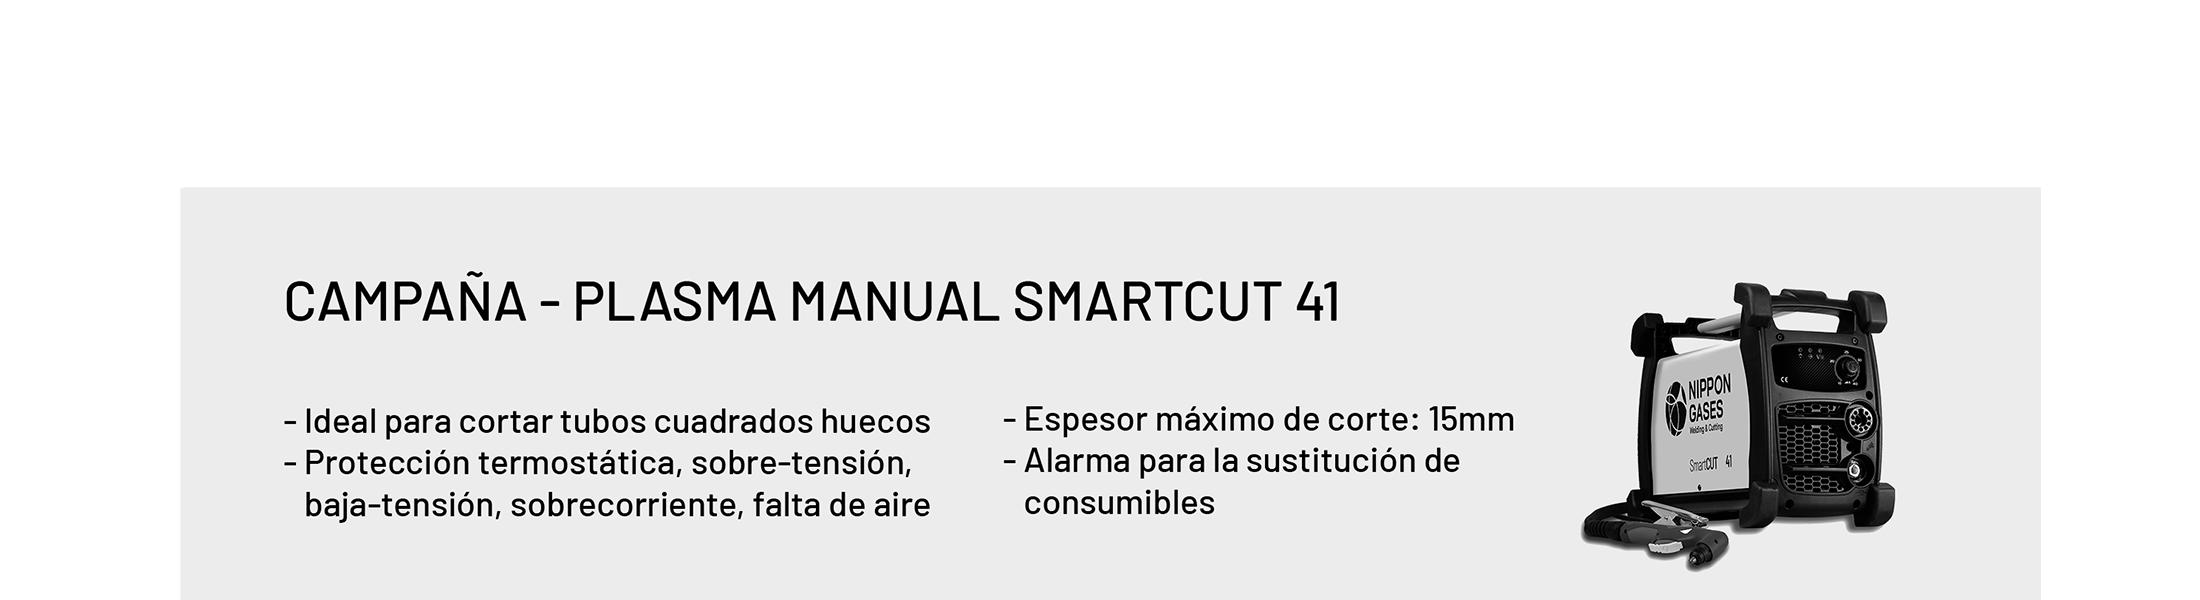 SMARTCUT41_-_BANNER